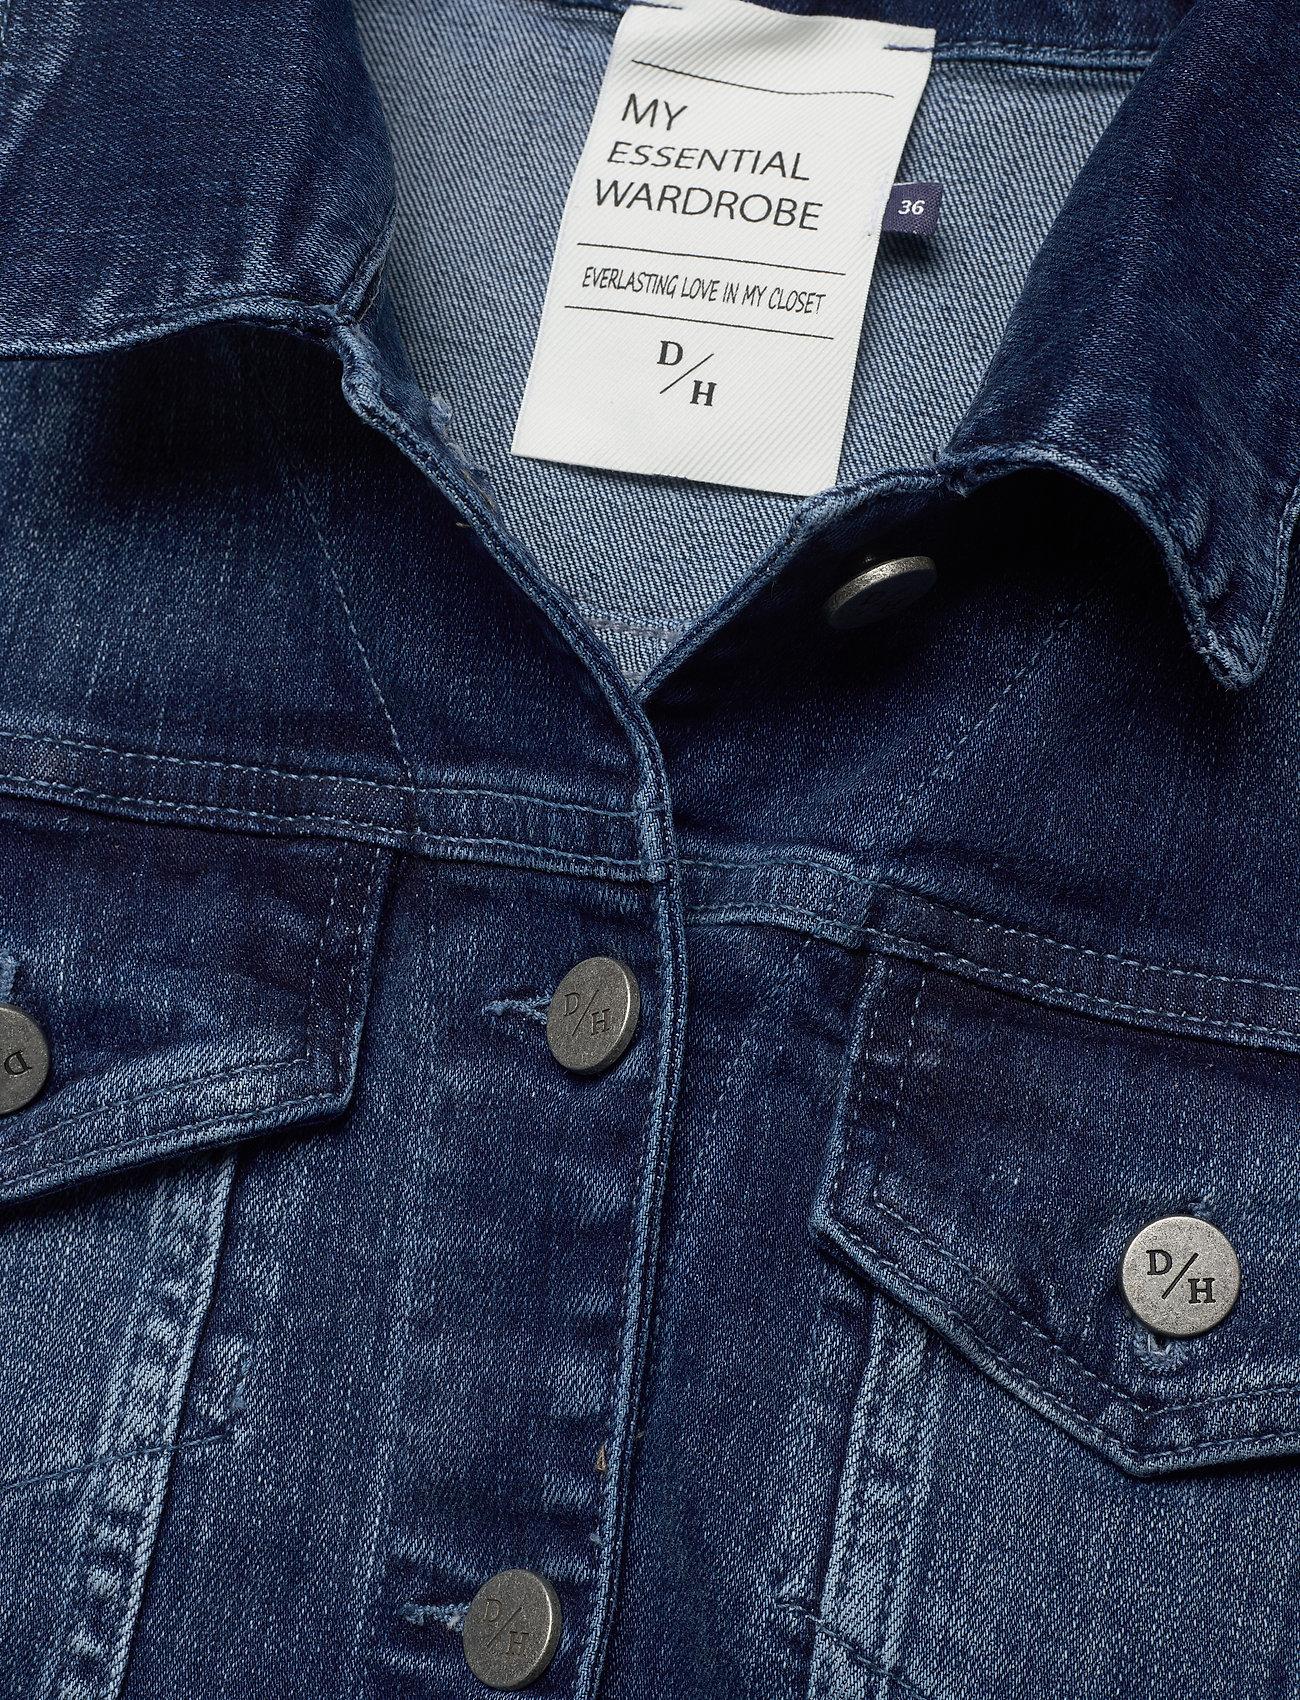 07 The Denim Jacket  - Denim Hunter